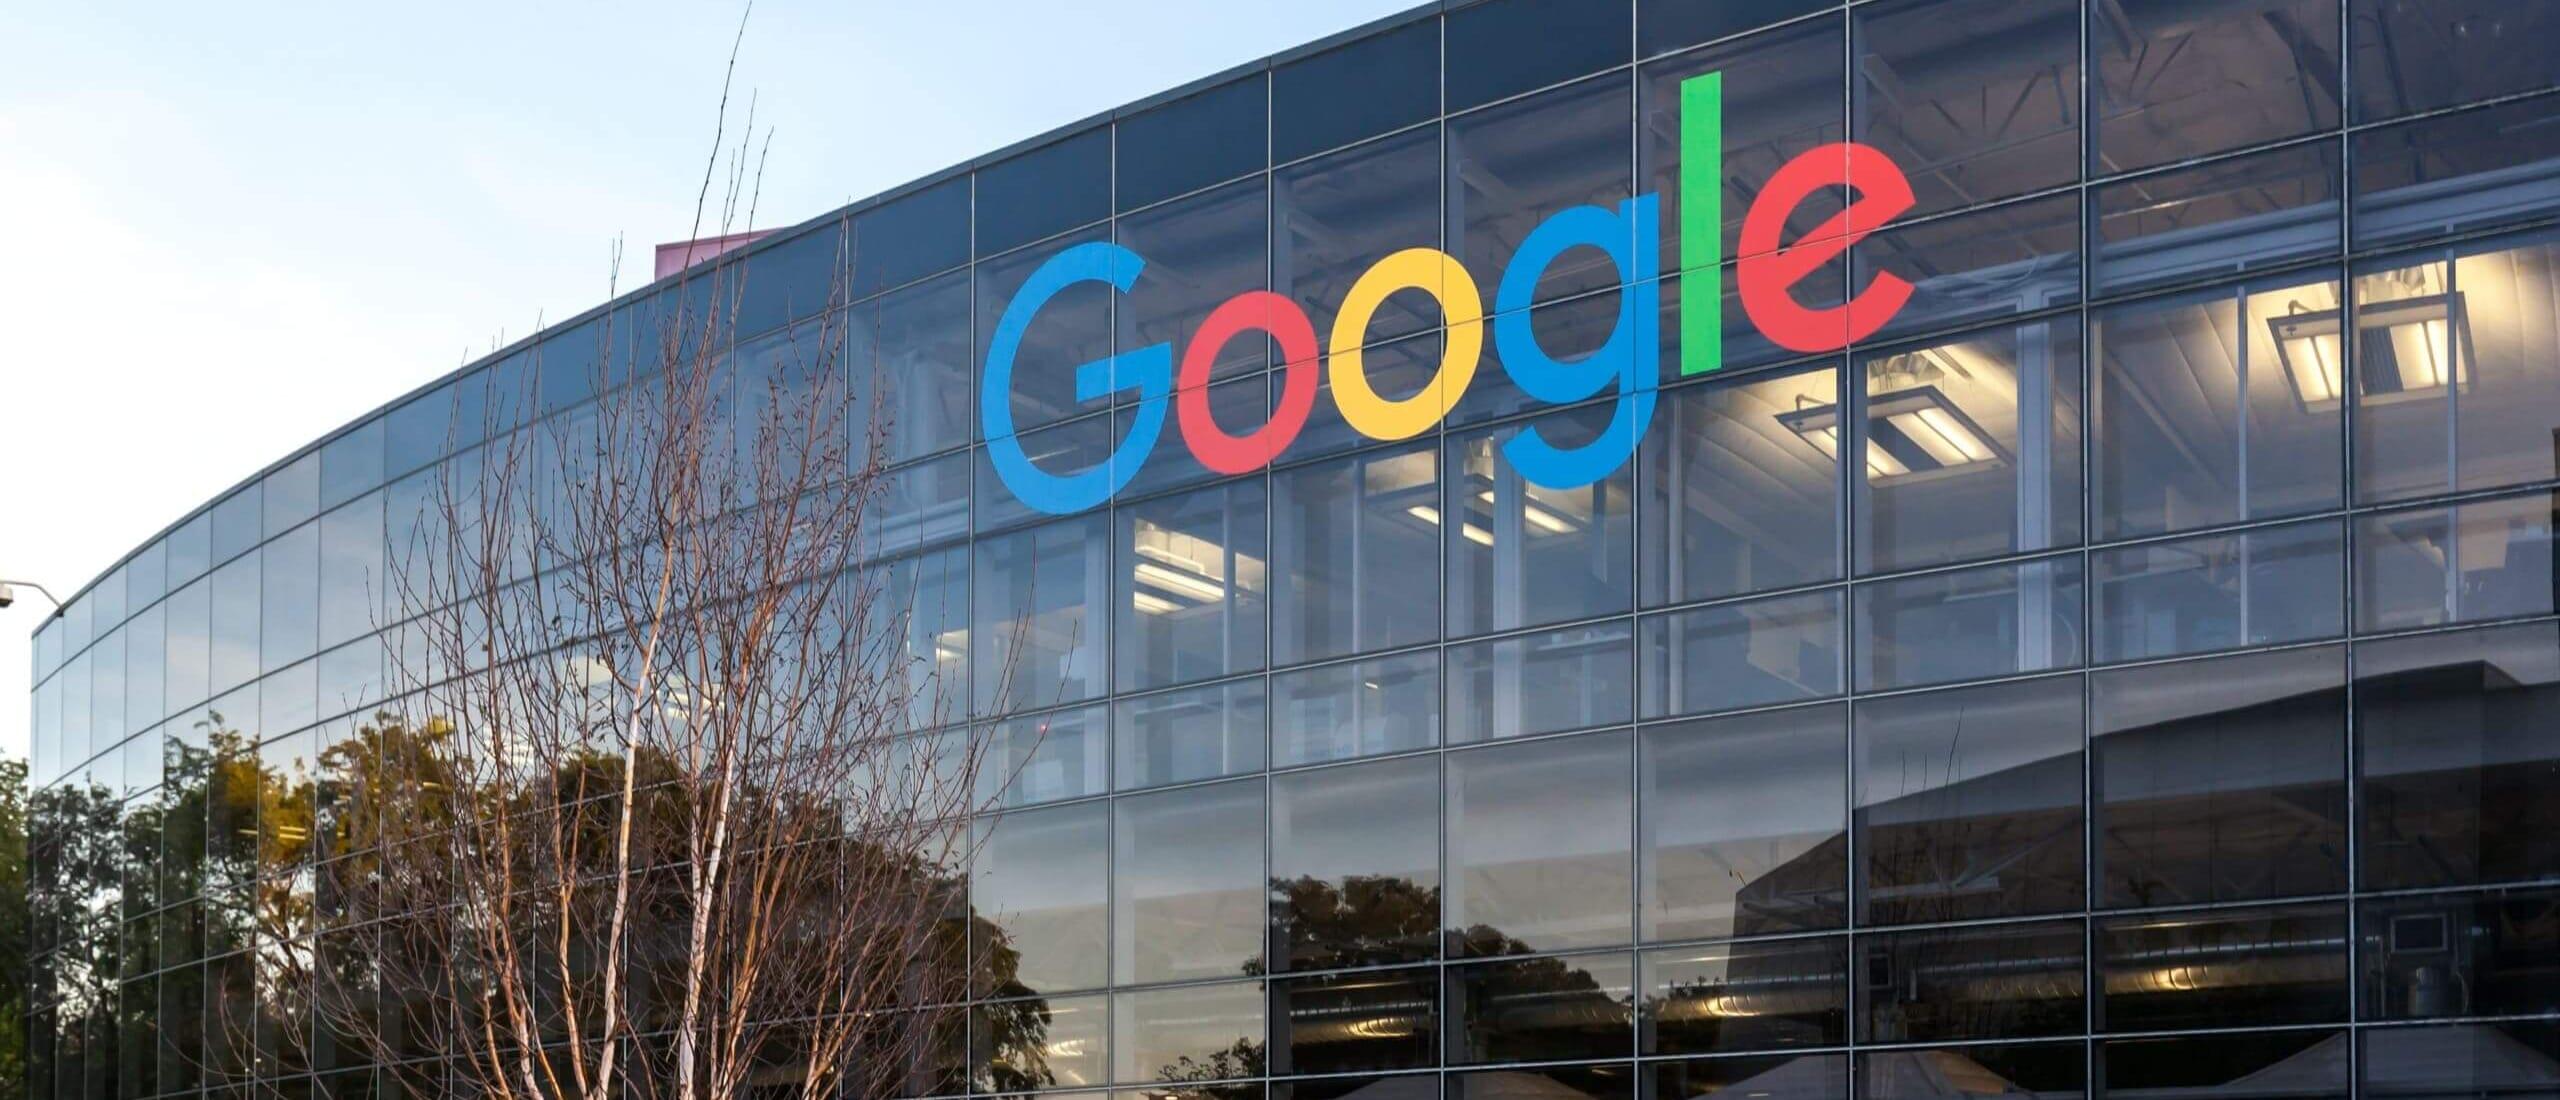 Google headquarters at dusk